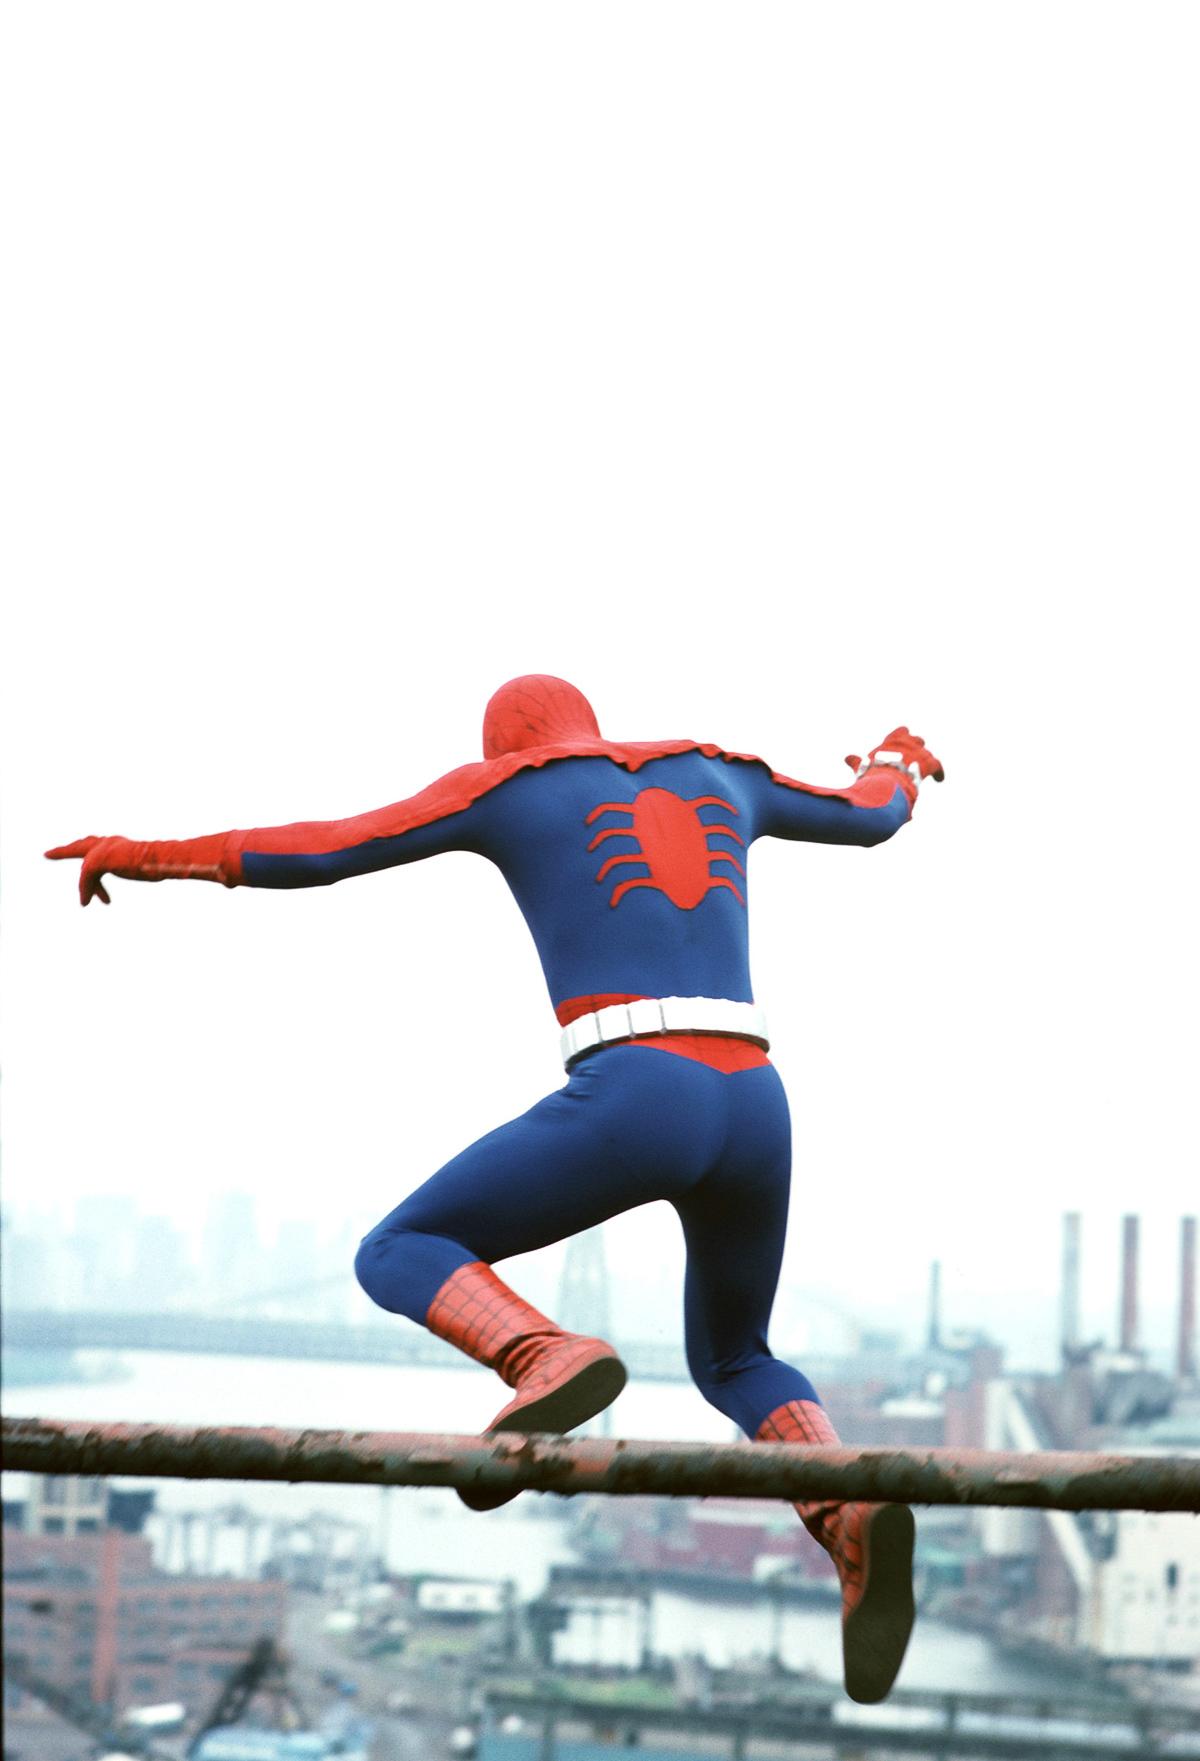 Man Youtube Makeup Gurus: No CGI, But The 1970s Spider-Man TV Show Had Spunk